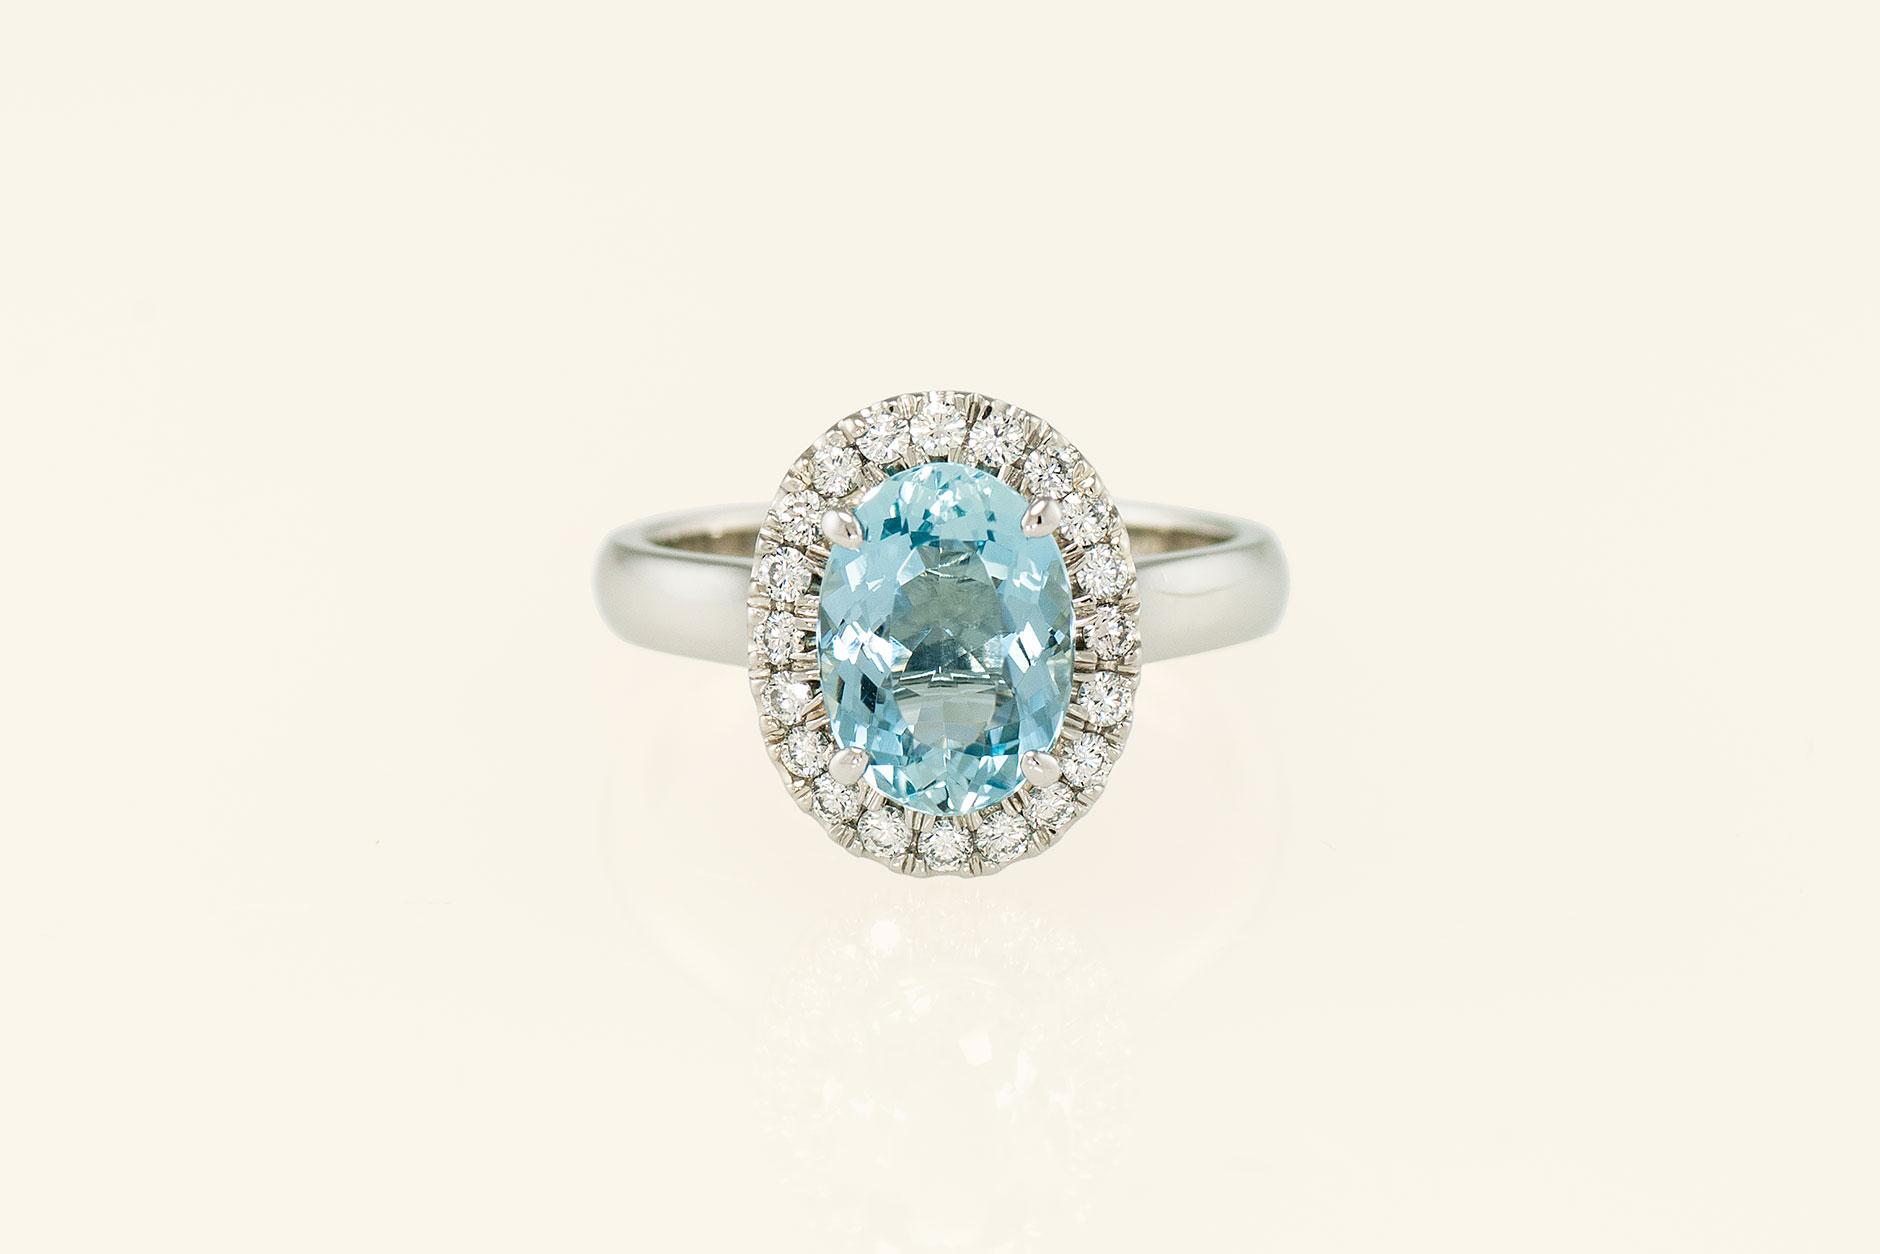 19k White Gold & Platinum Oval Aquamarine Halo Ring w Diamonds - NEWA Goldsmith